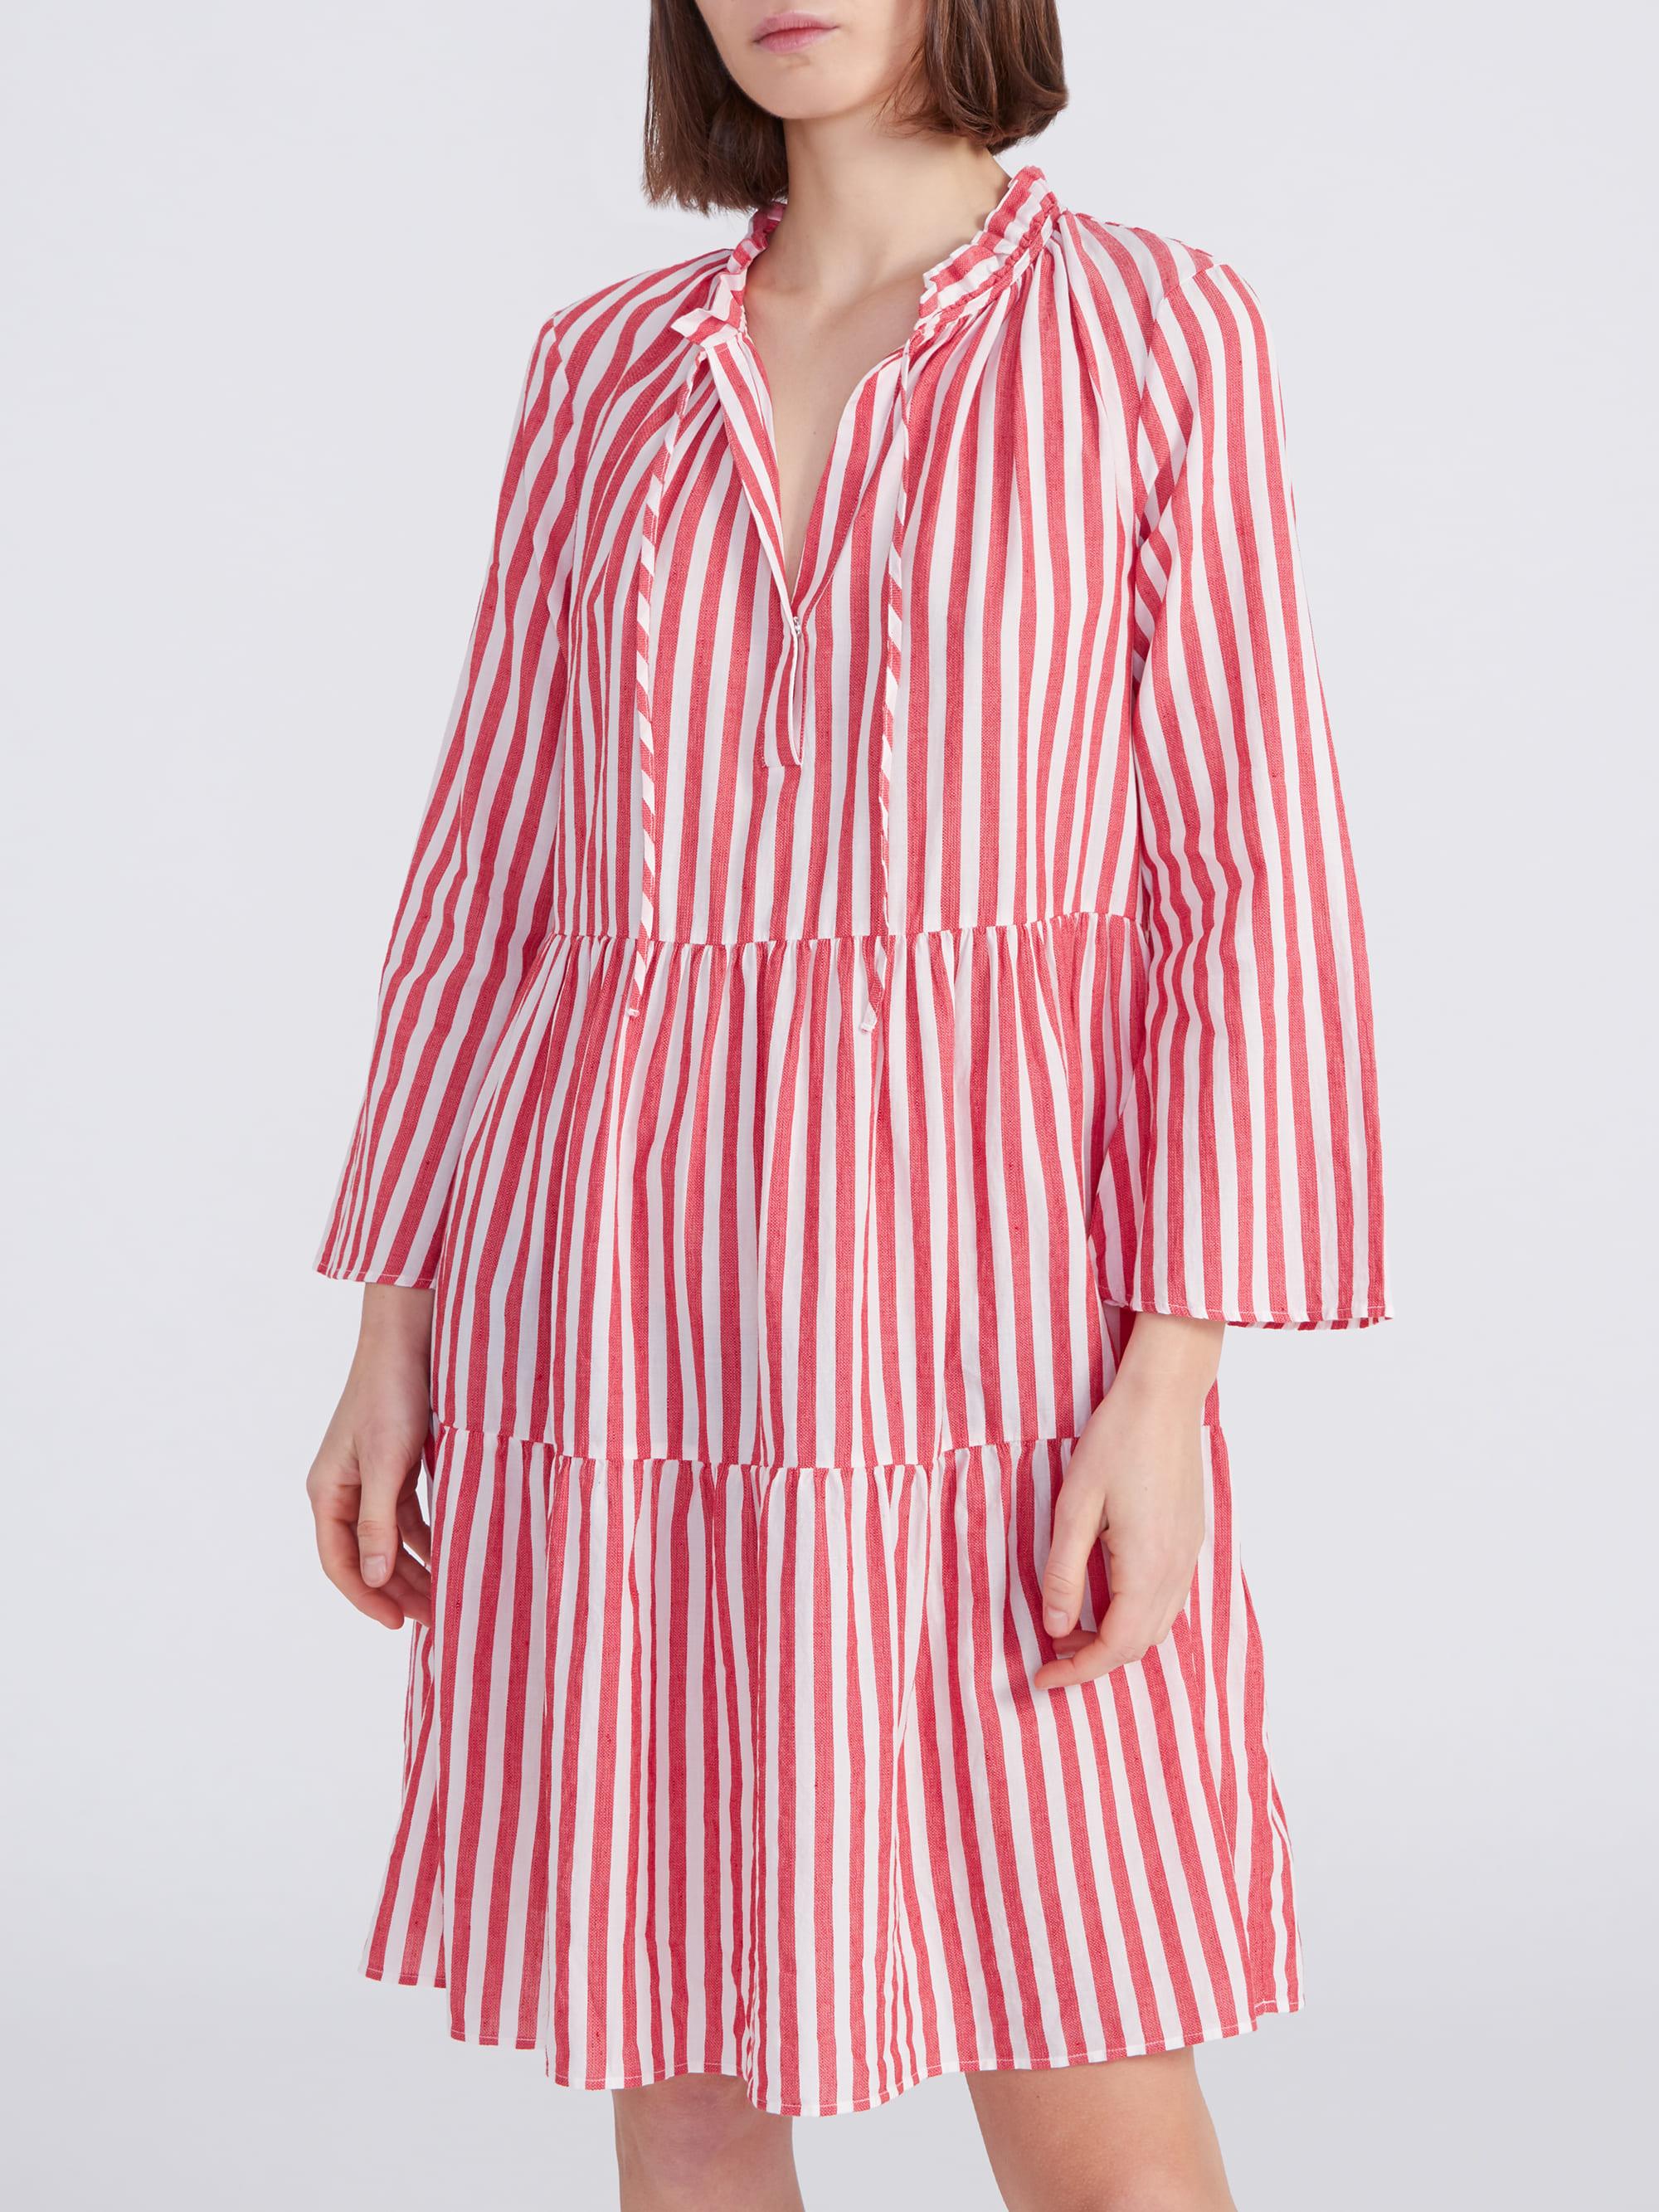 Kleid Milly Stripes Rot